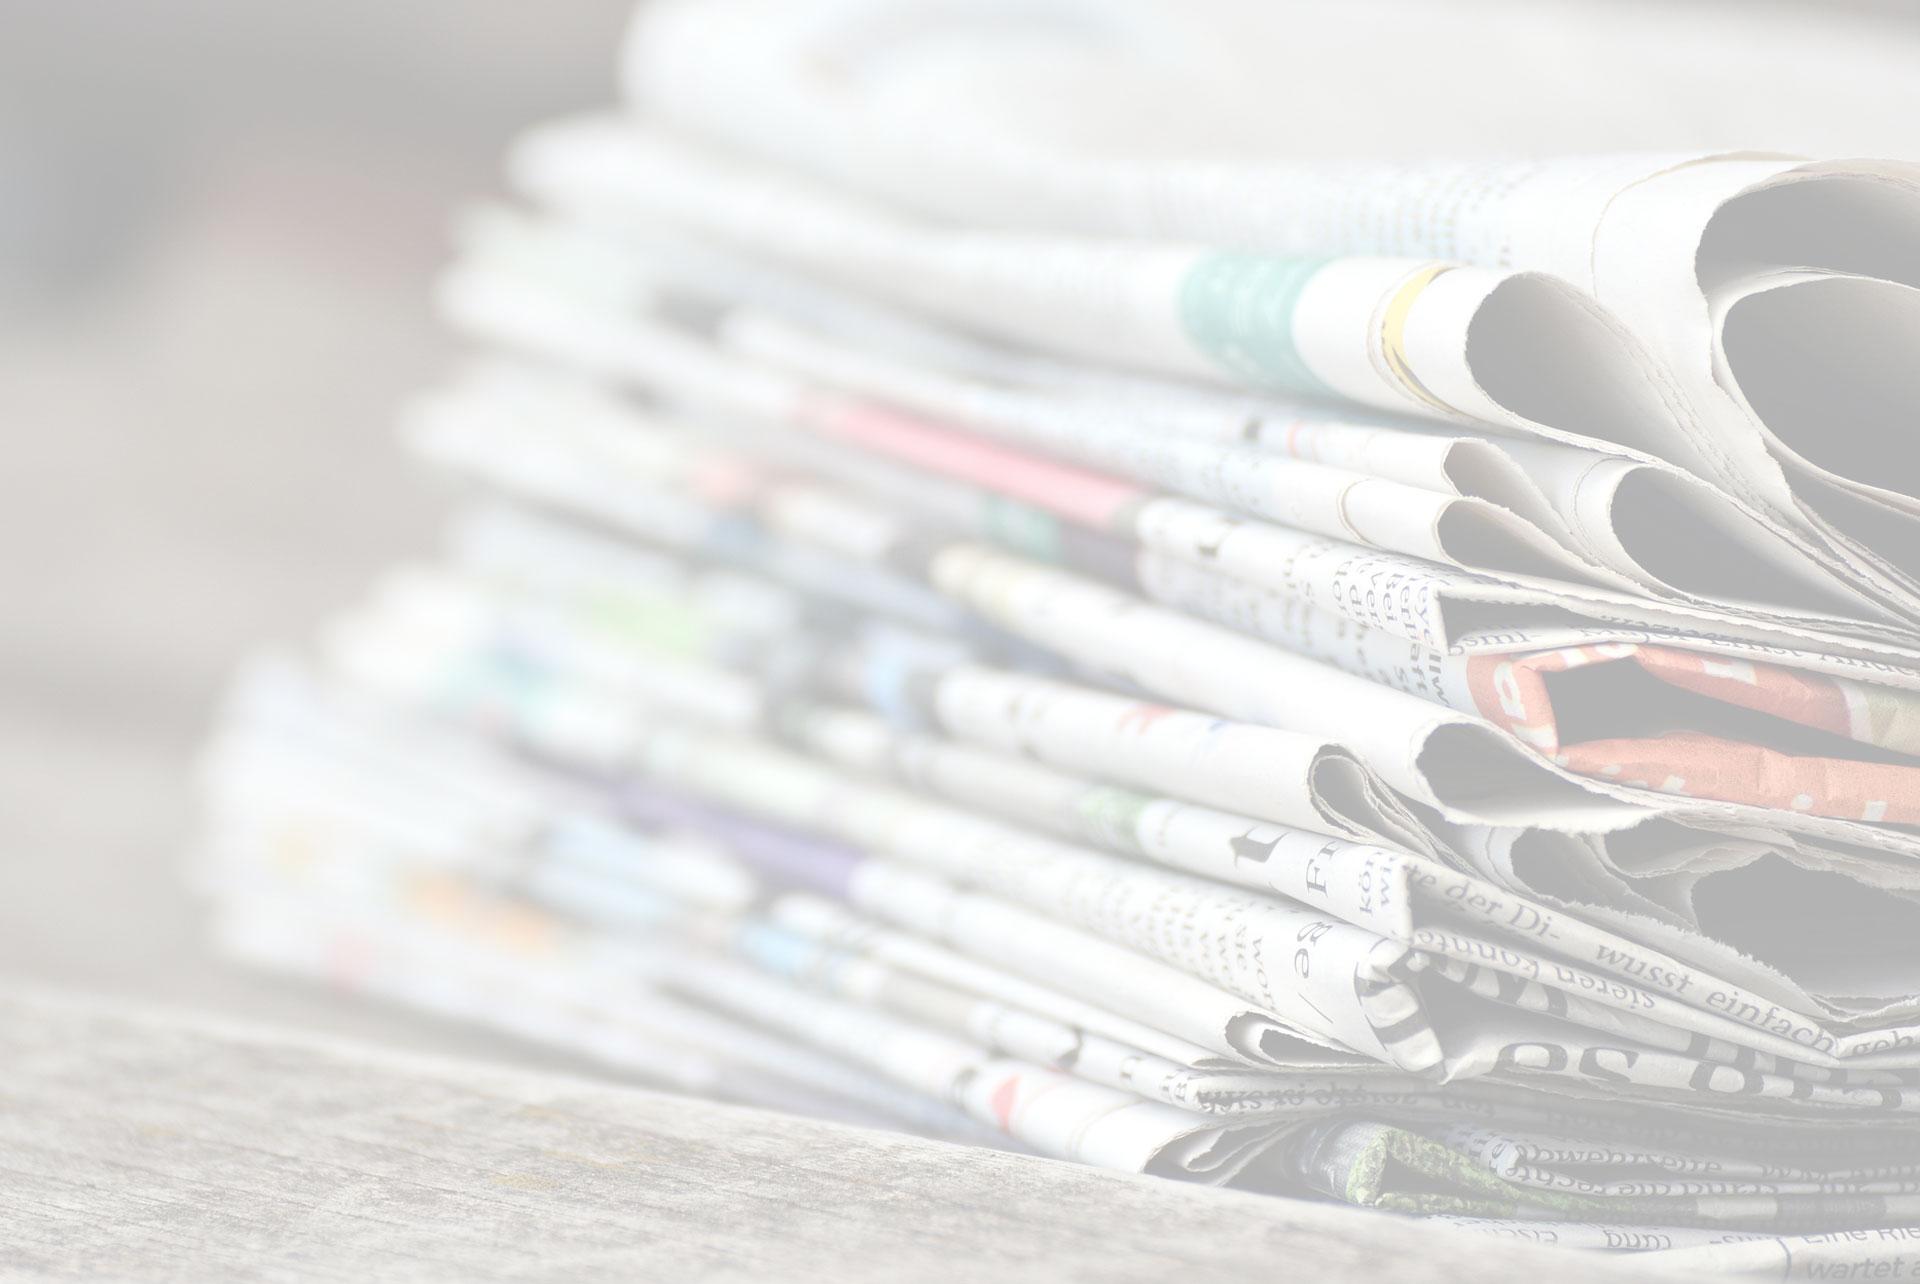 strumenti password rubate